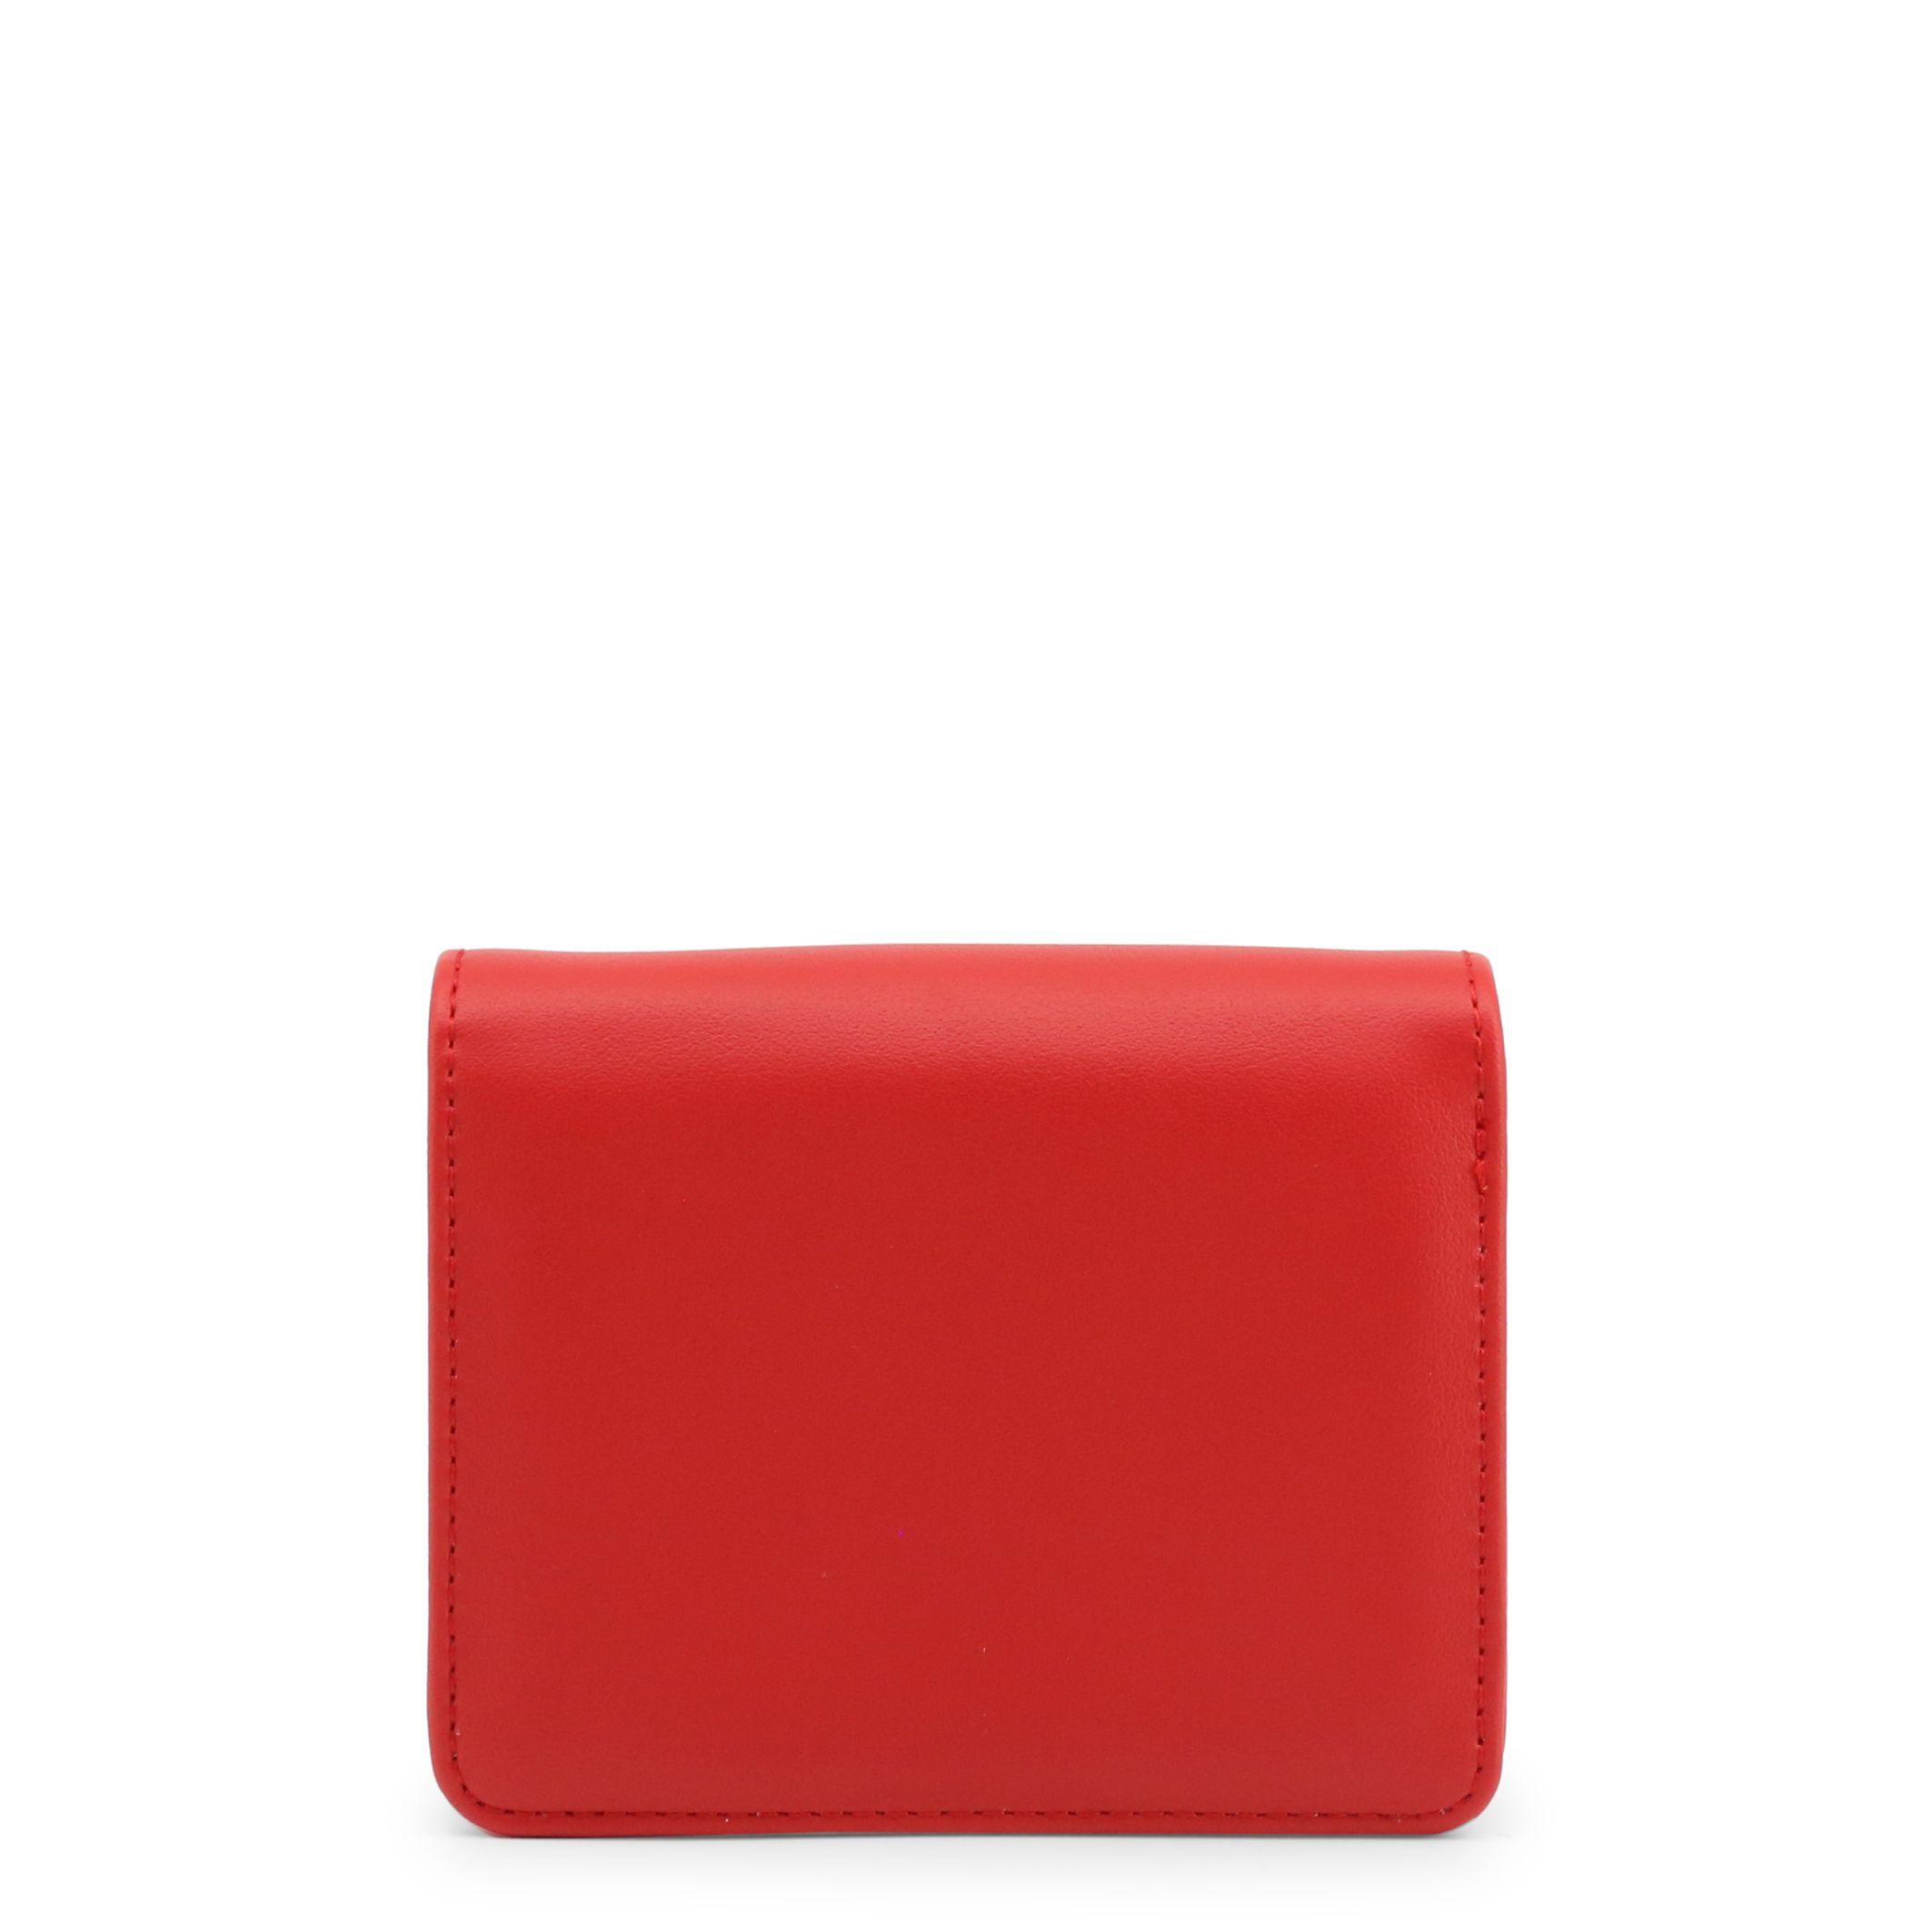 D21837C0 8B27 11Eb Abbe 756064413543 Love Moschino - Jc5625Pp1Clf0 - Red